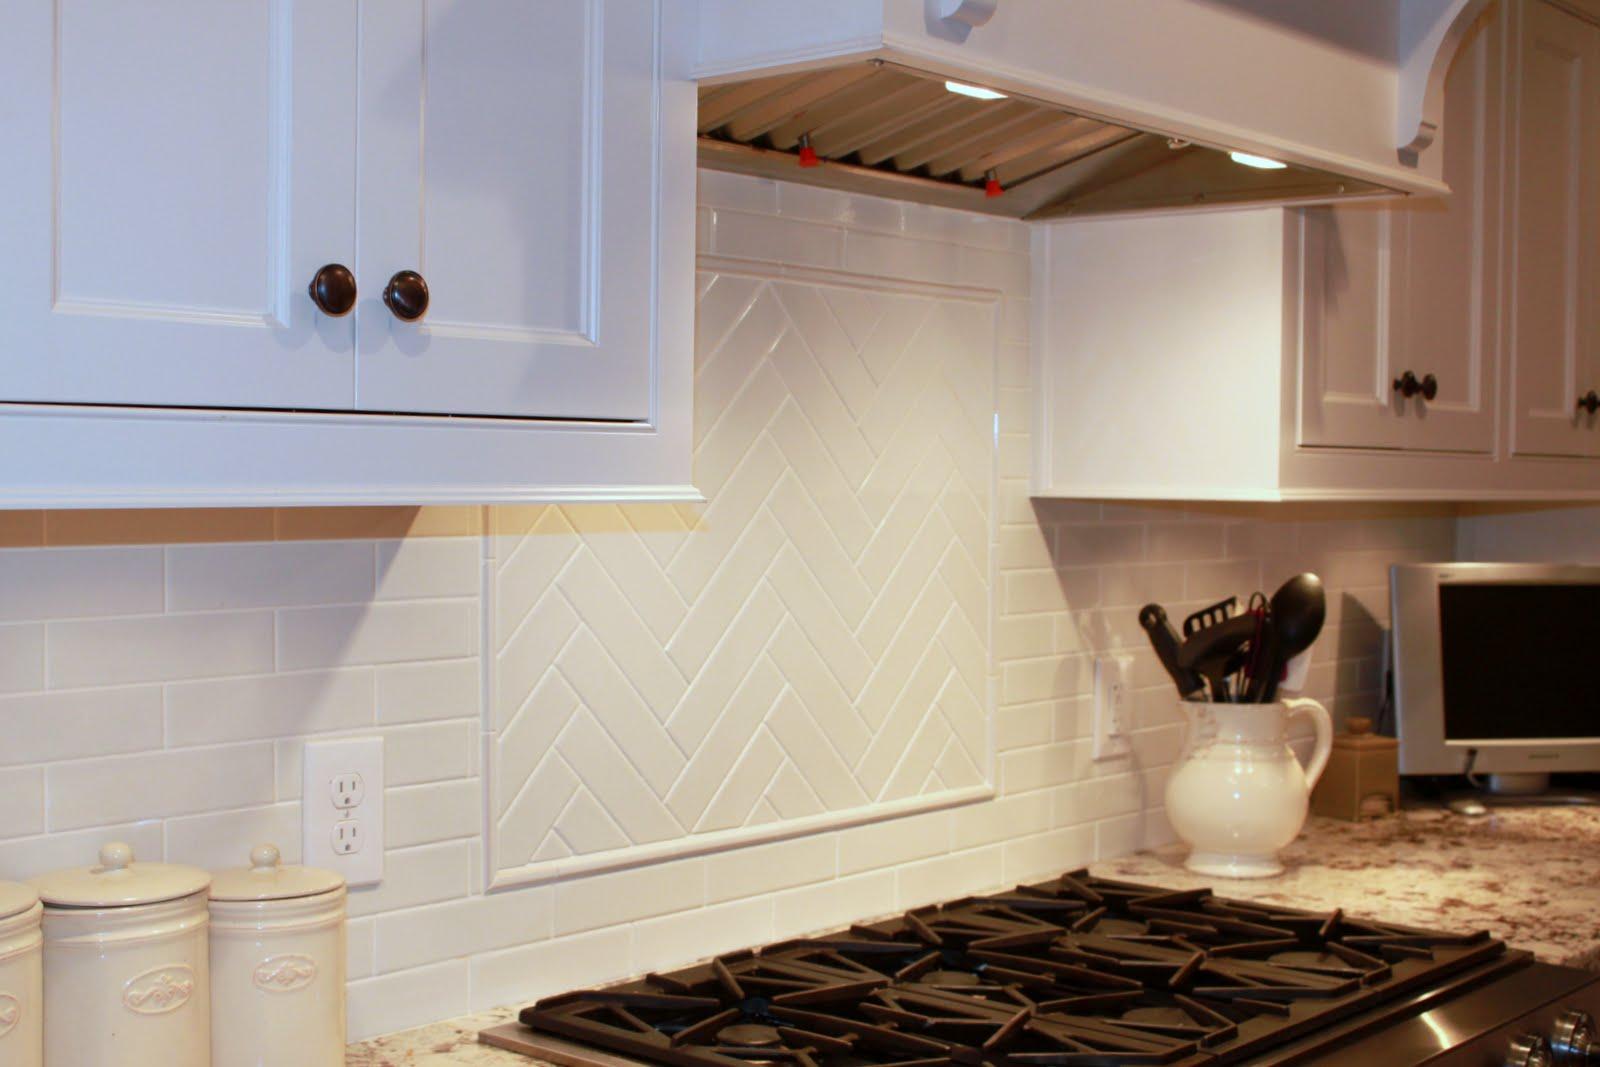 Herringbone Kitchen Backsplash Photos: Oak Ridge Revival: Timeless And Classic